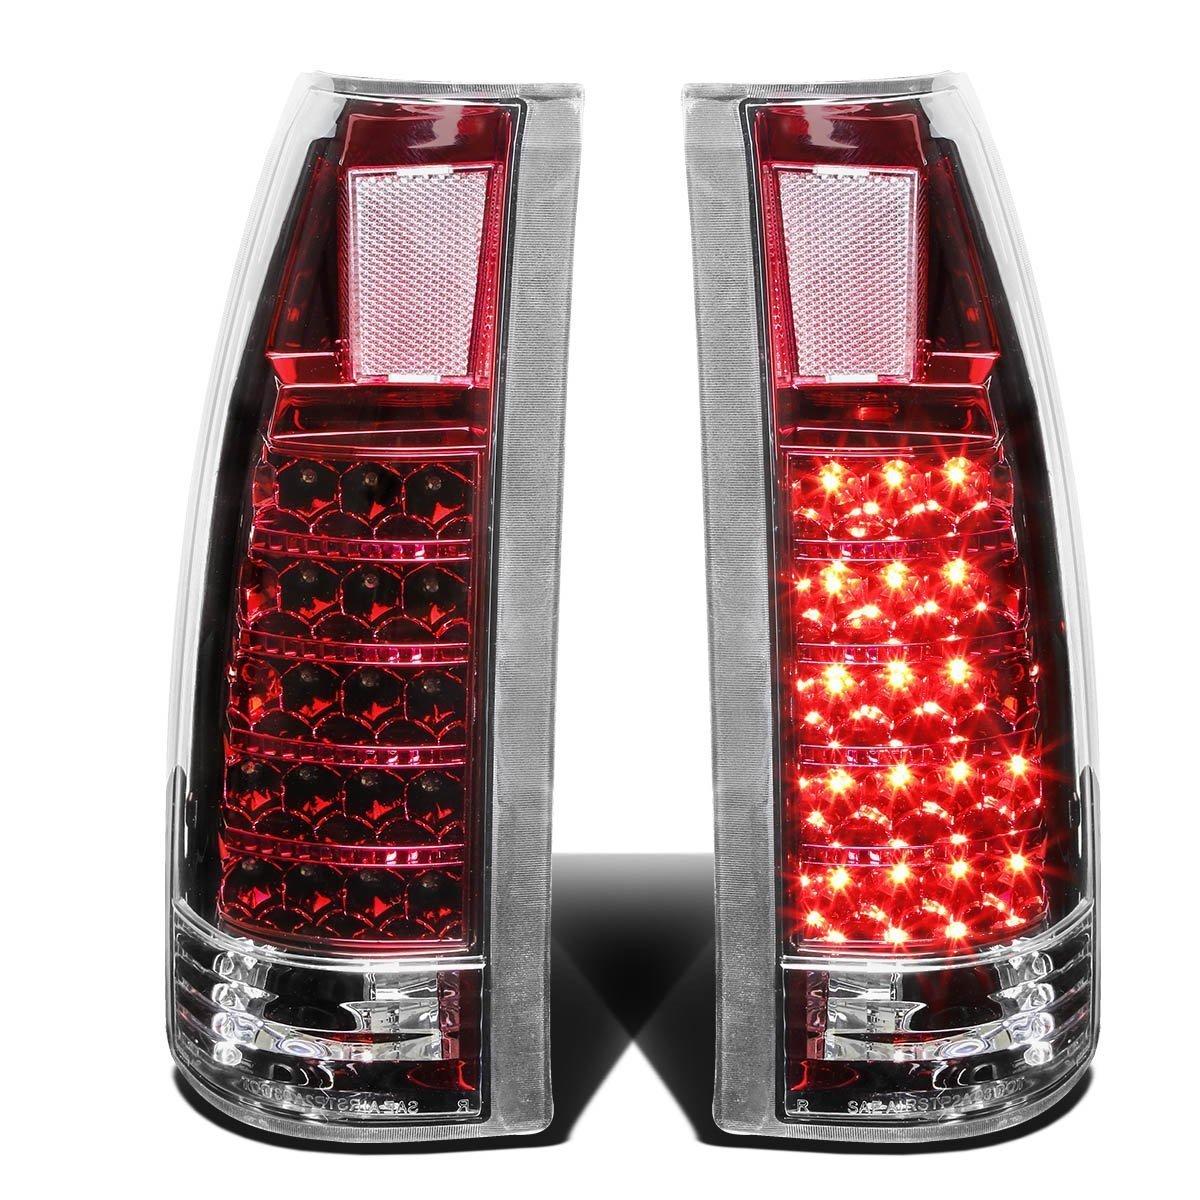 Rxmotor Chevy C1500 C2500 C3500 Full Size Blazer Tahoe GMC Yukon Suburban 1500 2500 Pickup Tail Light LED Rear Brake Lights Lamps Lamp Pair (Red Chrome)